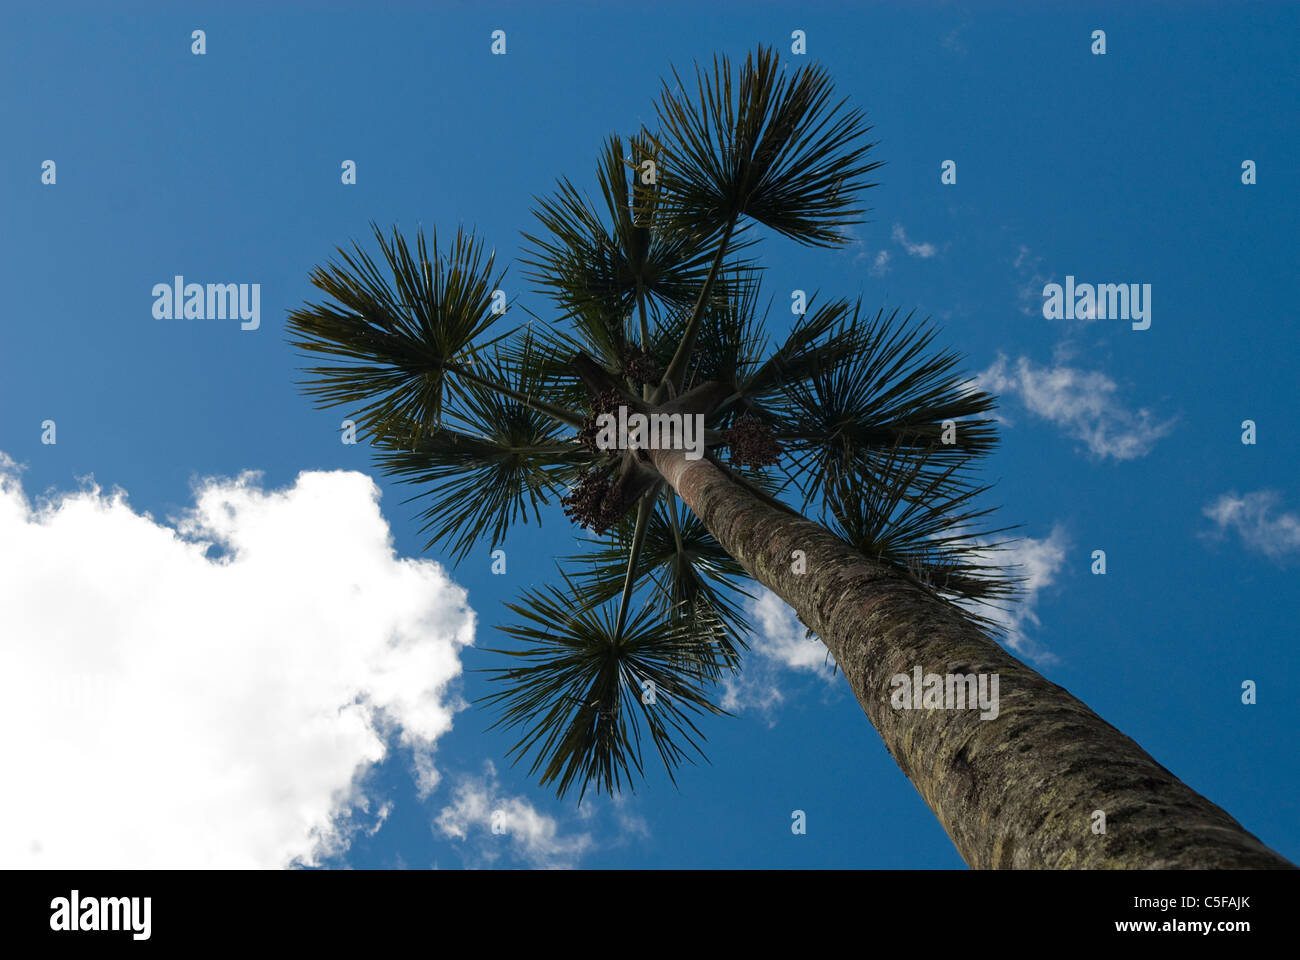 Chapada dos Veadeiros, Brazil. Babassu palm tree (Orbignya speciosa, Attralea speciosa). - Stock Image